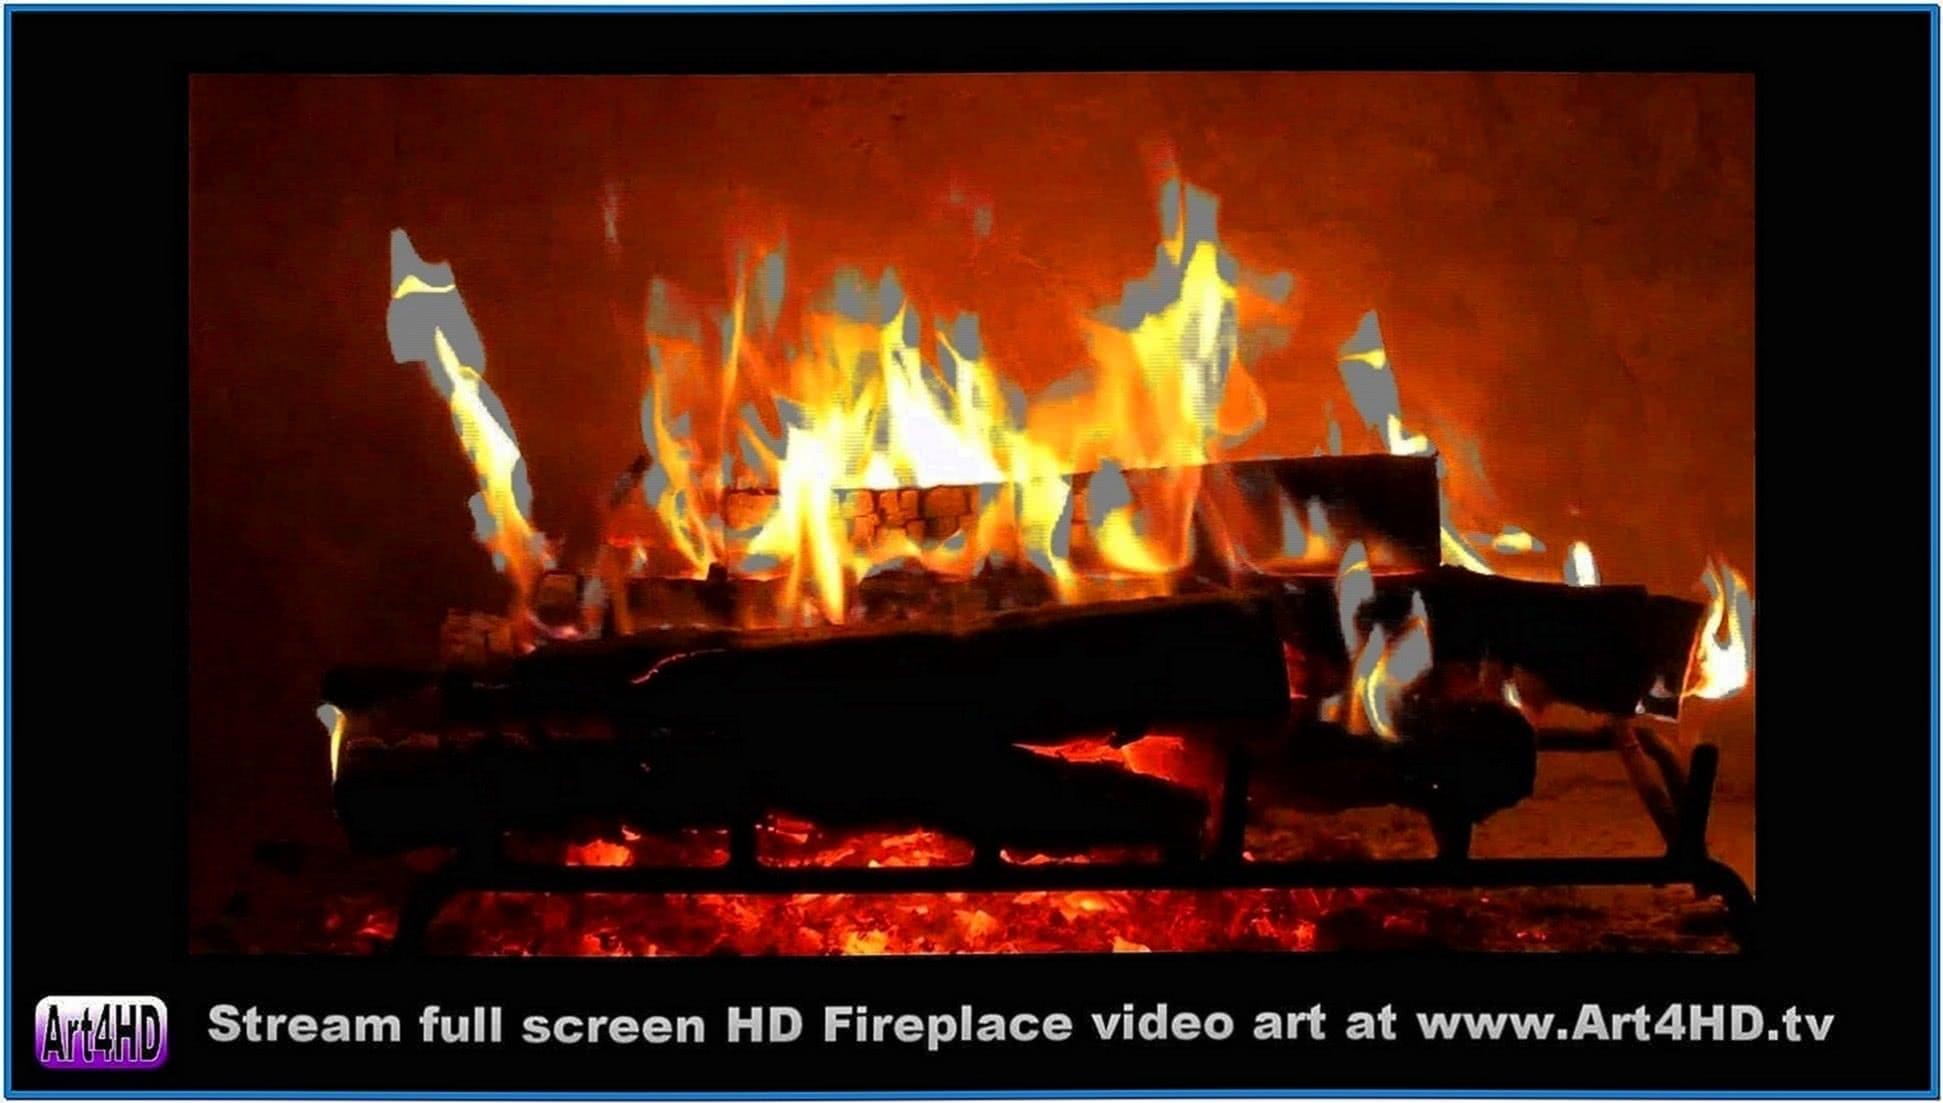 HD TV Fire Screensaver